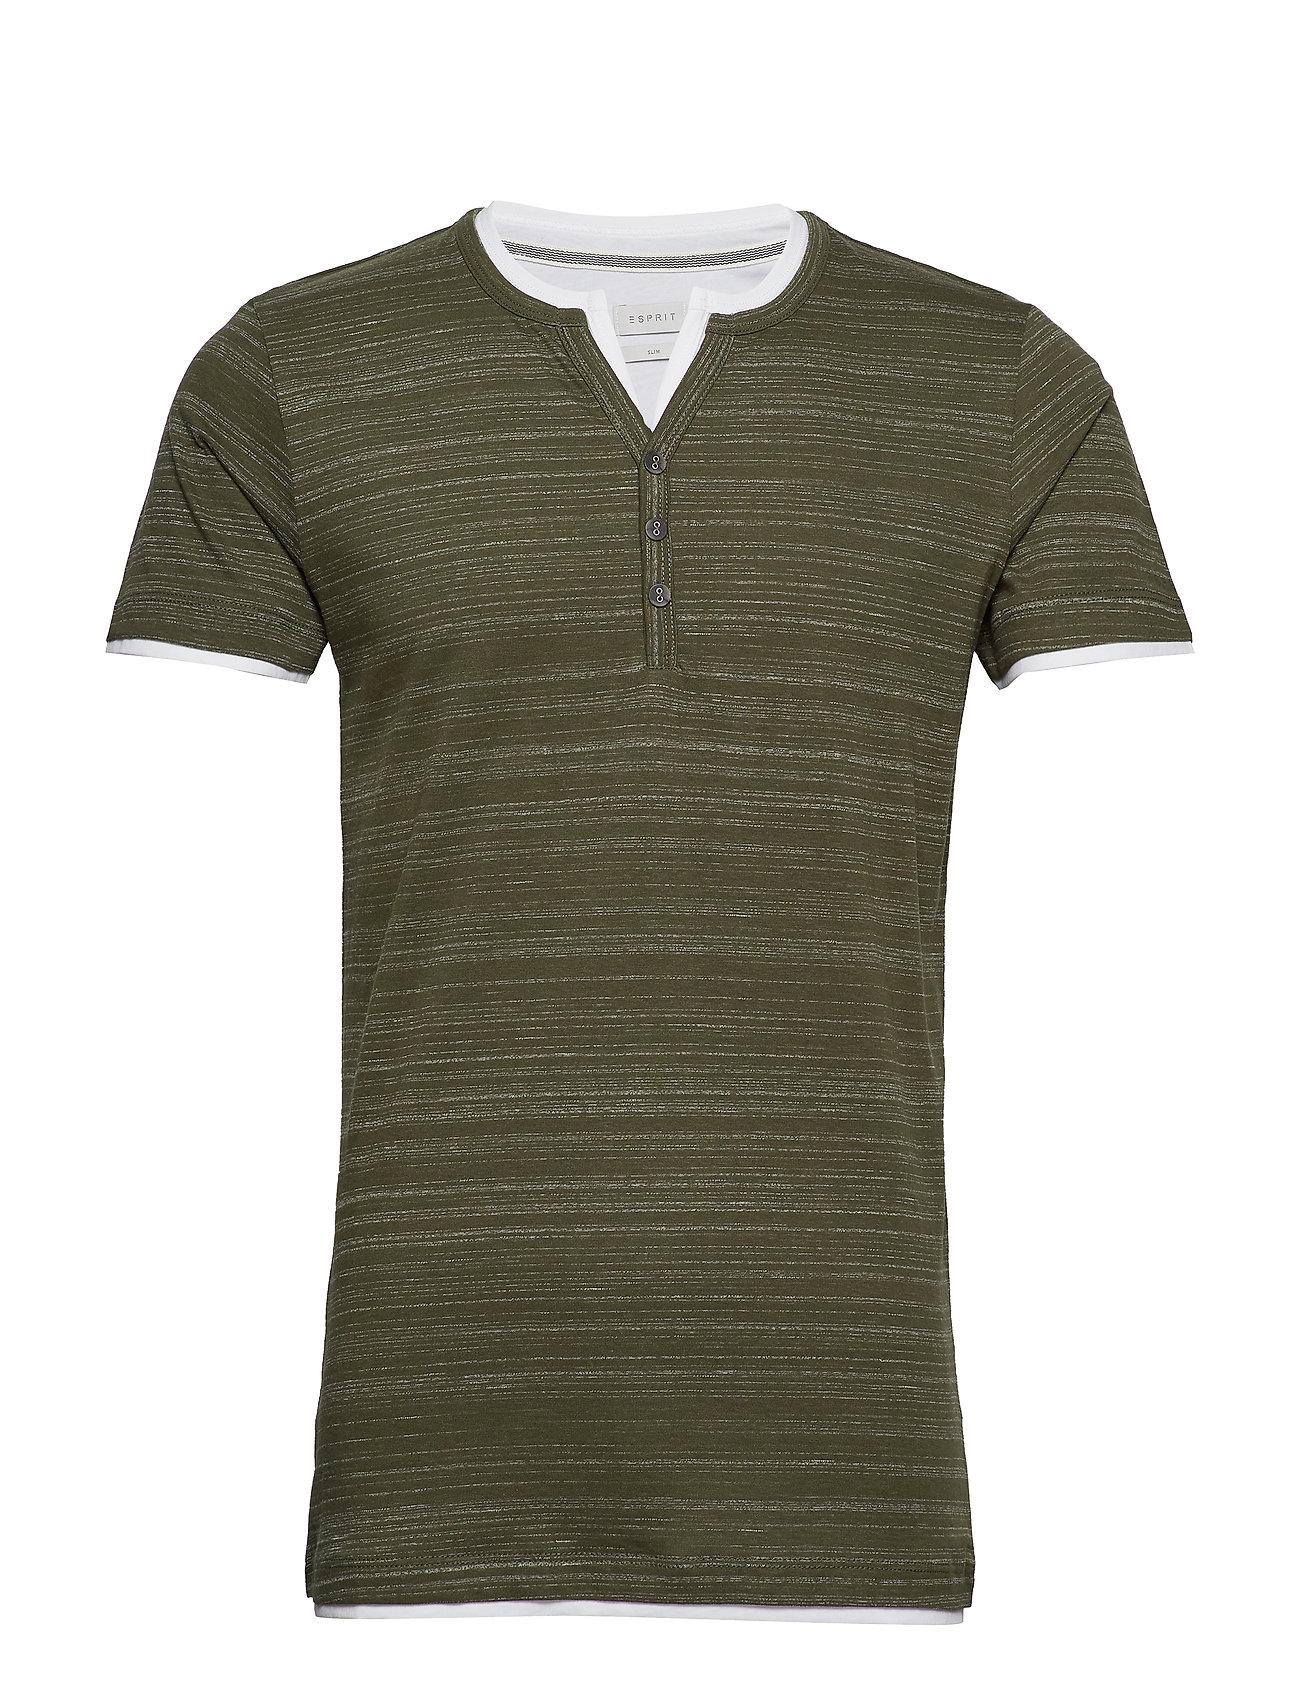 Esprit Casual T-Shirts - KHAKI GREEN